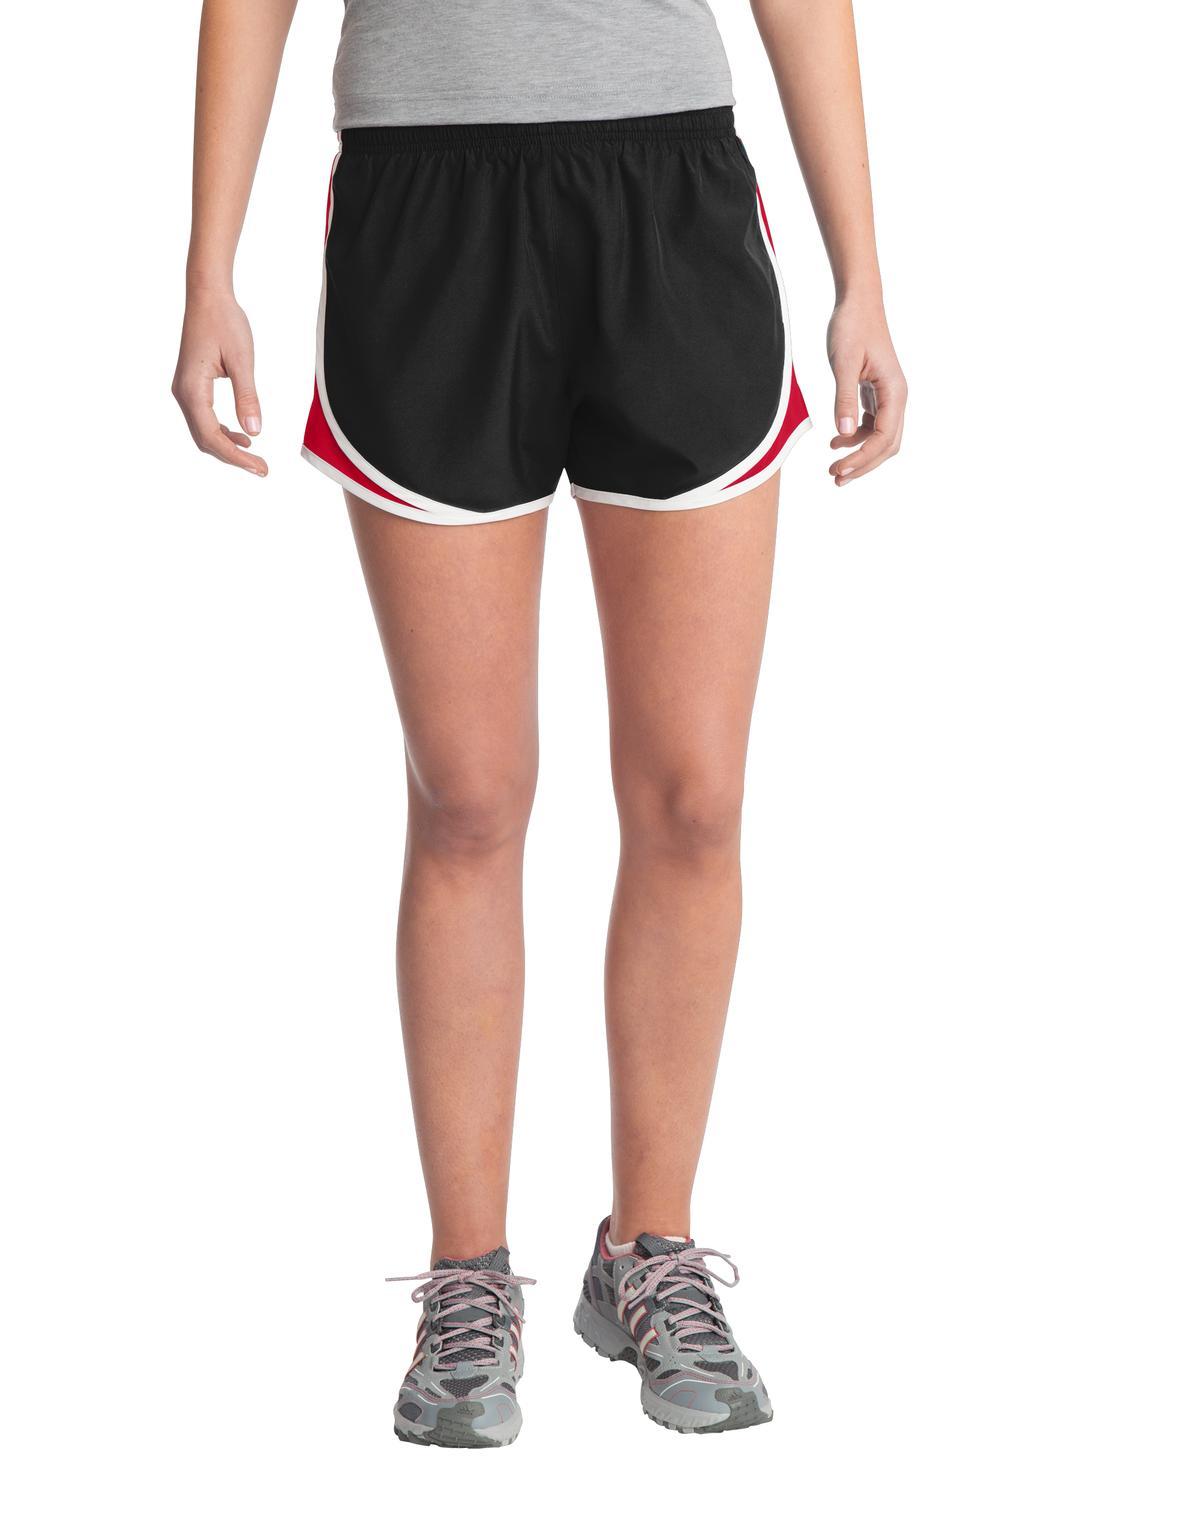 Sport-Tek® Ladies Cadence Short.-Sport-Tek